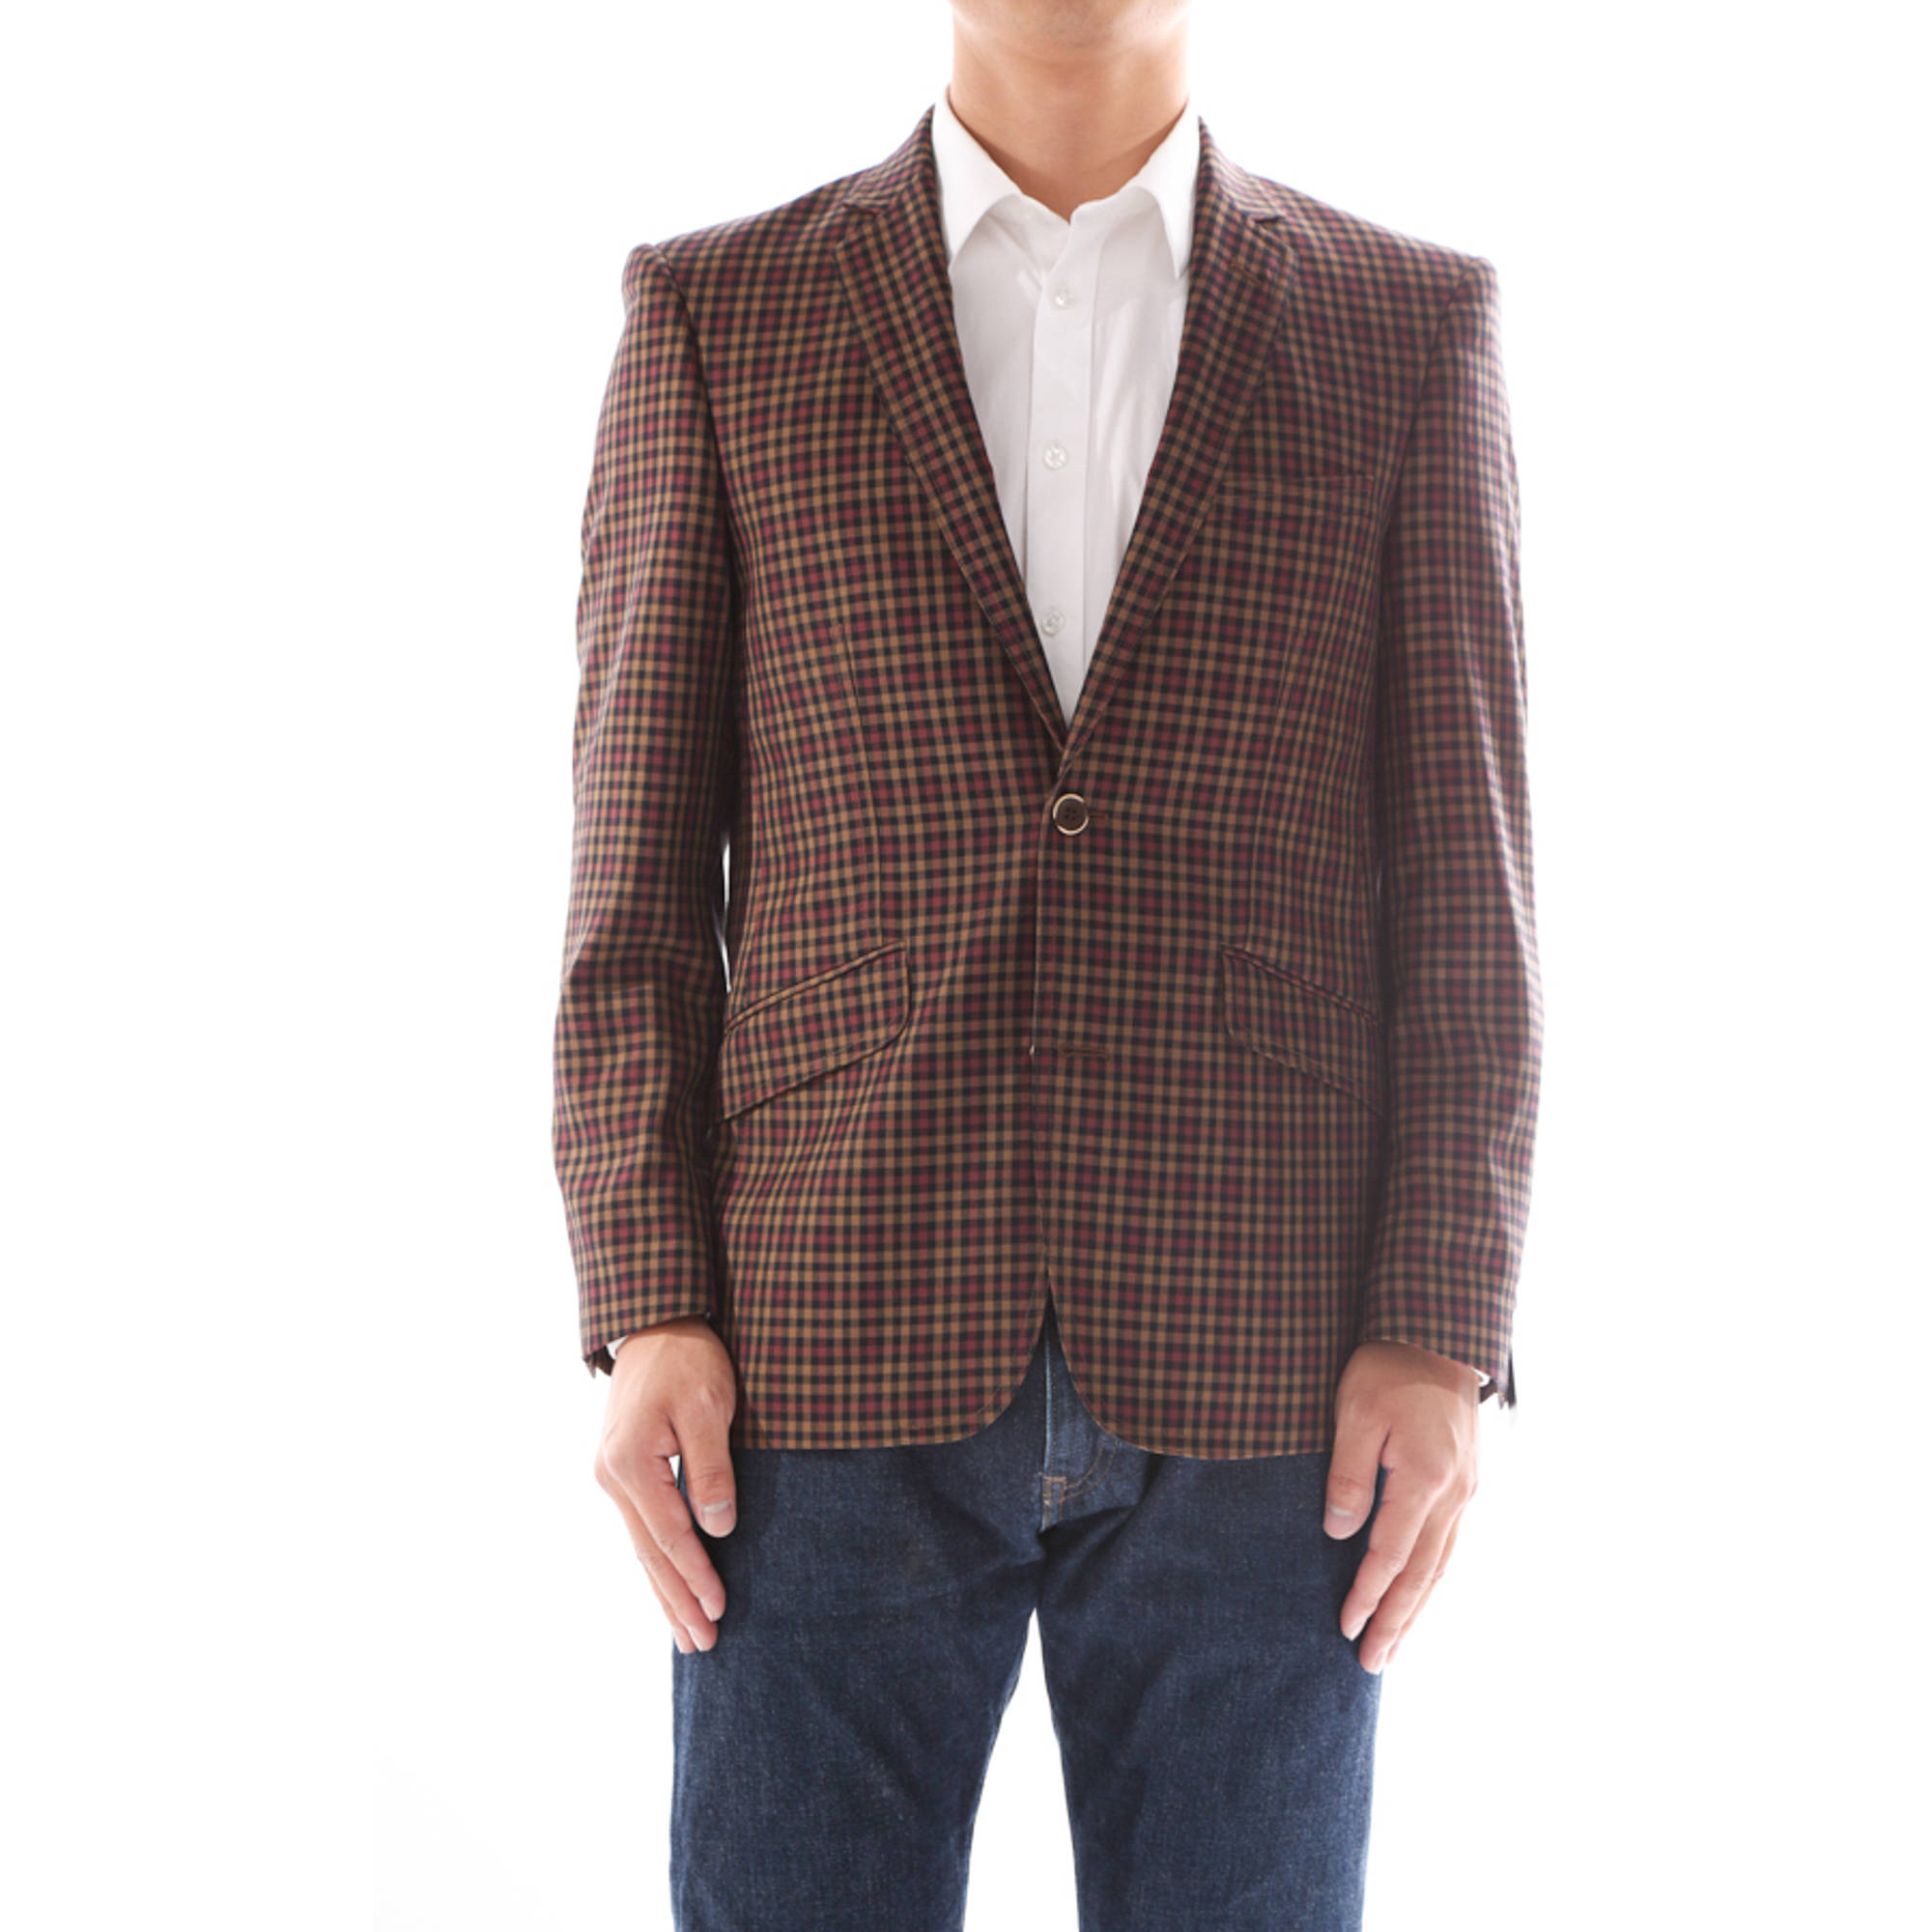 Verno Civello Men's Brown and burgundy Micro-Plaid Slim Fit Italian Styled Blazer